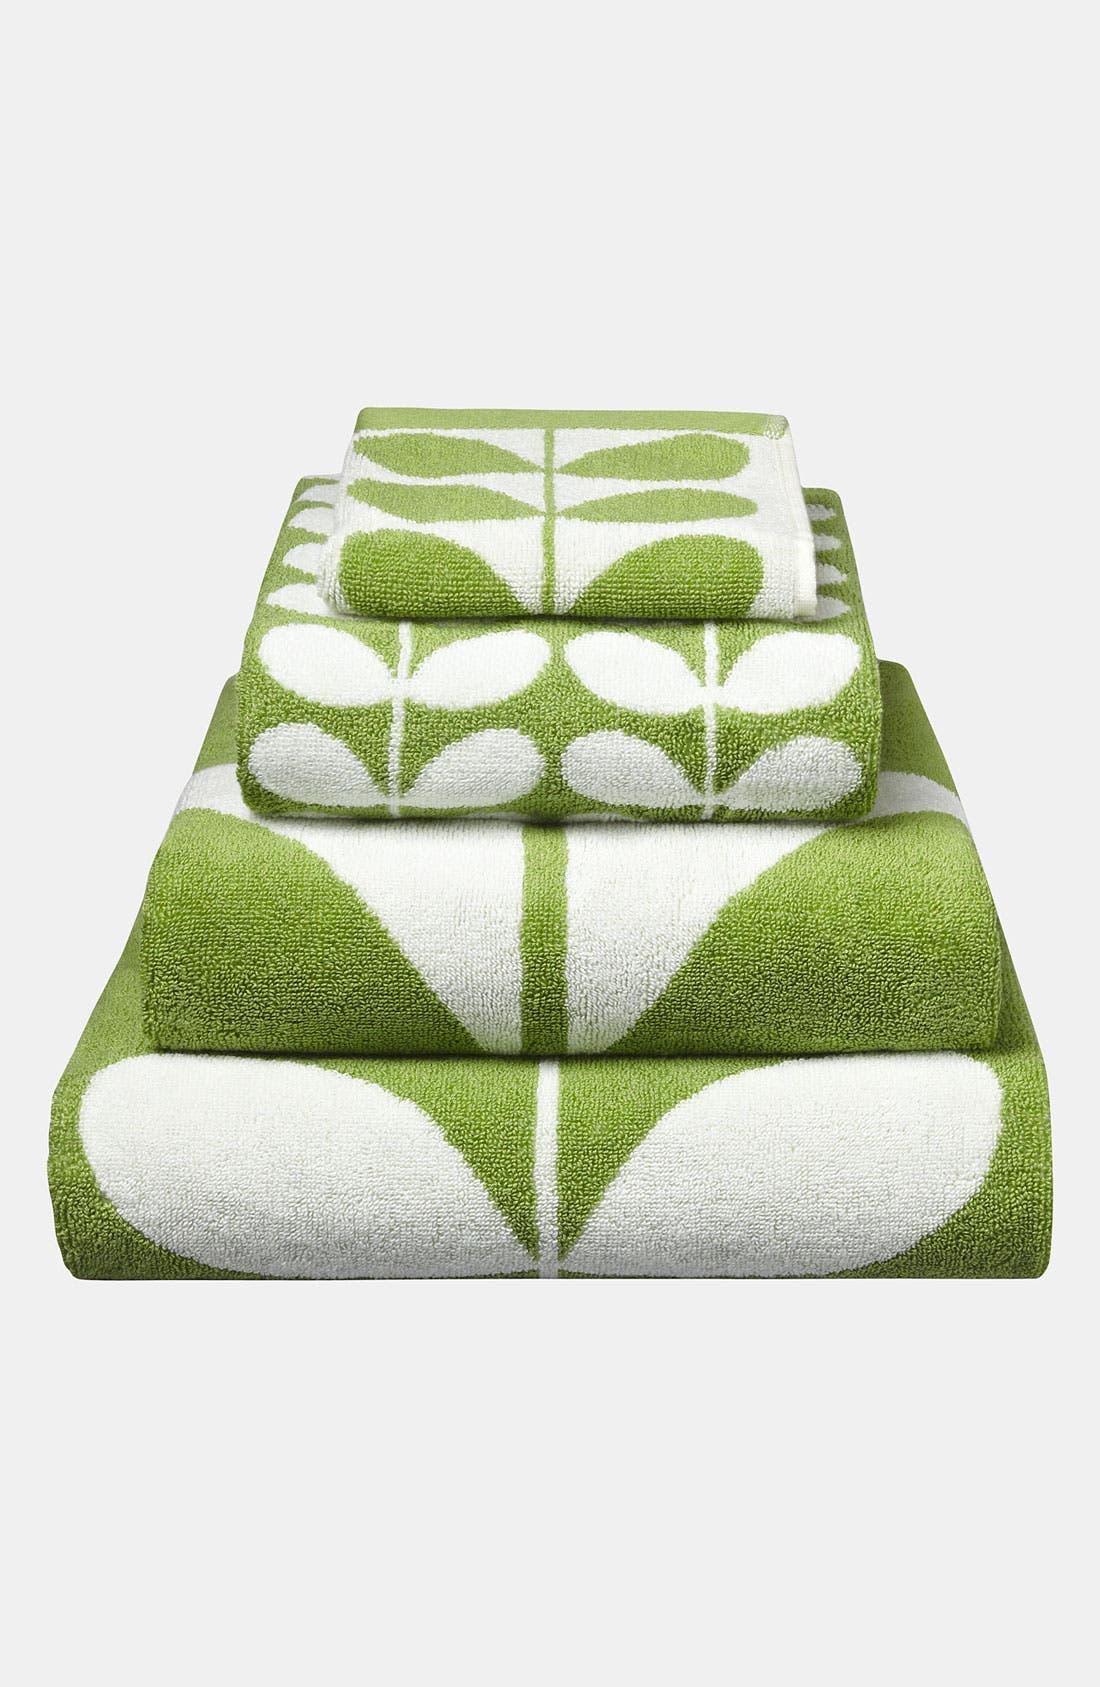 Alternate Image 1 Selected - Orla Kiely 'Stem Jacquard' Bath Towel